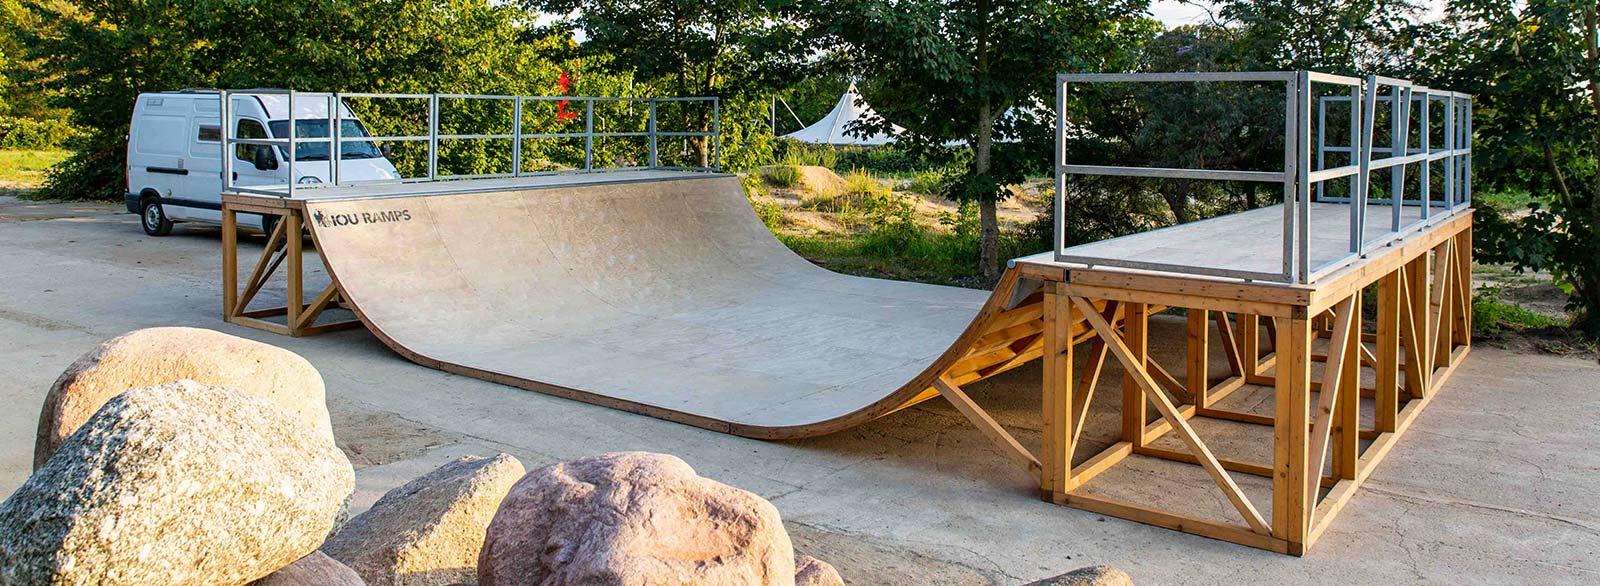 portable_skateboard_minirampe_1